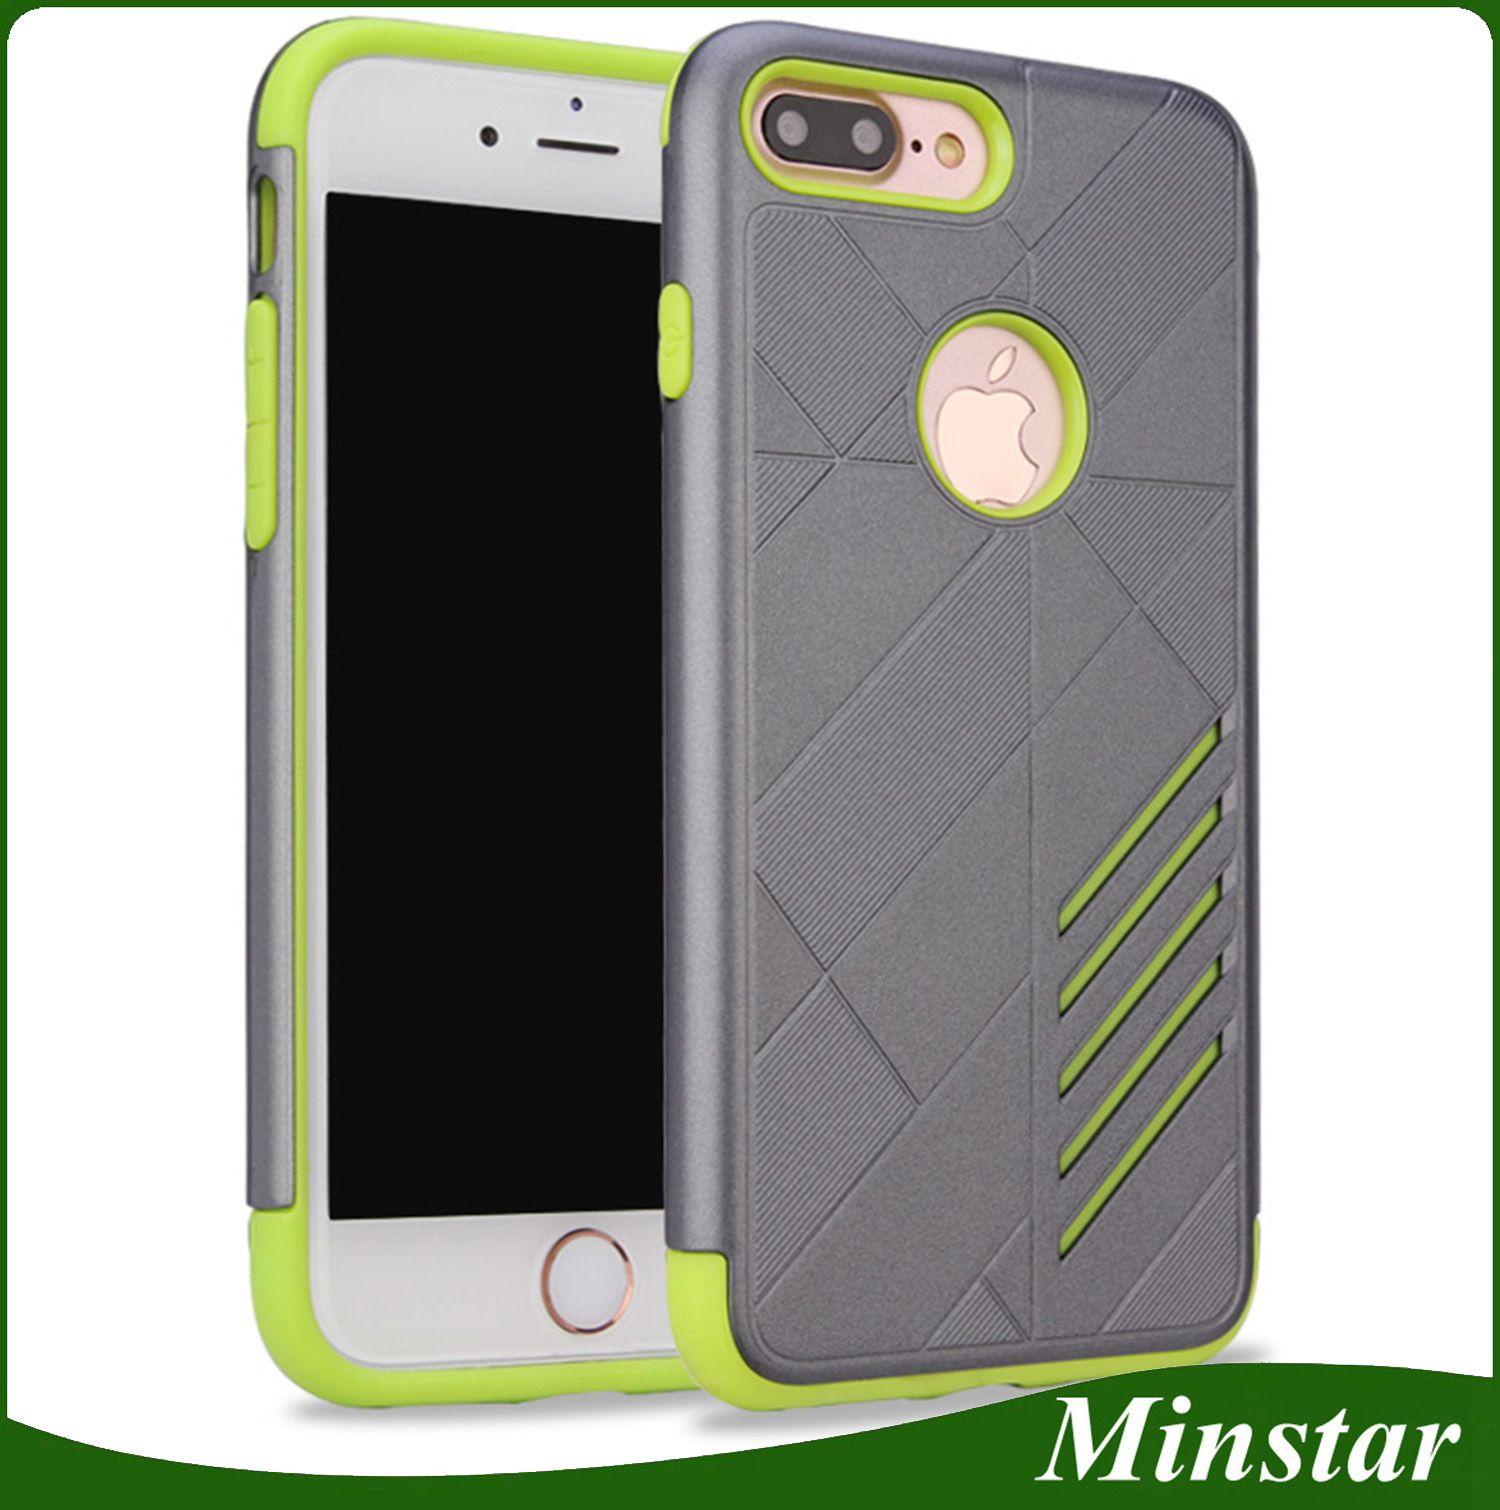 hot sale online 744df 8589b For Alcatel Pixi 4 5.5 6.0 Inch 2in1 Hybrid Armor Cover Stellar Tru Fierce  4 Caseology Cheap Phone Case 50PCS/Color